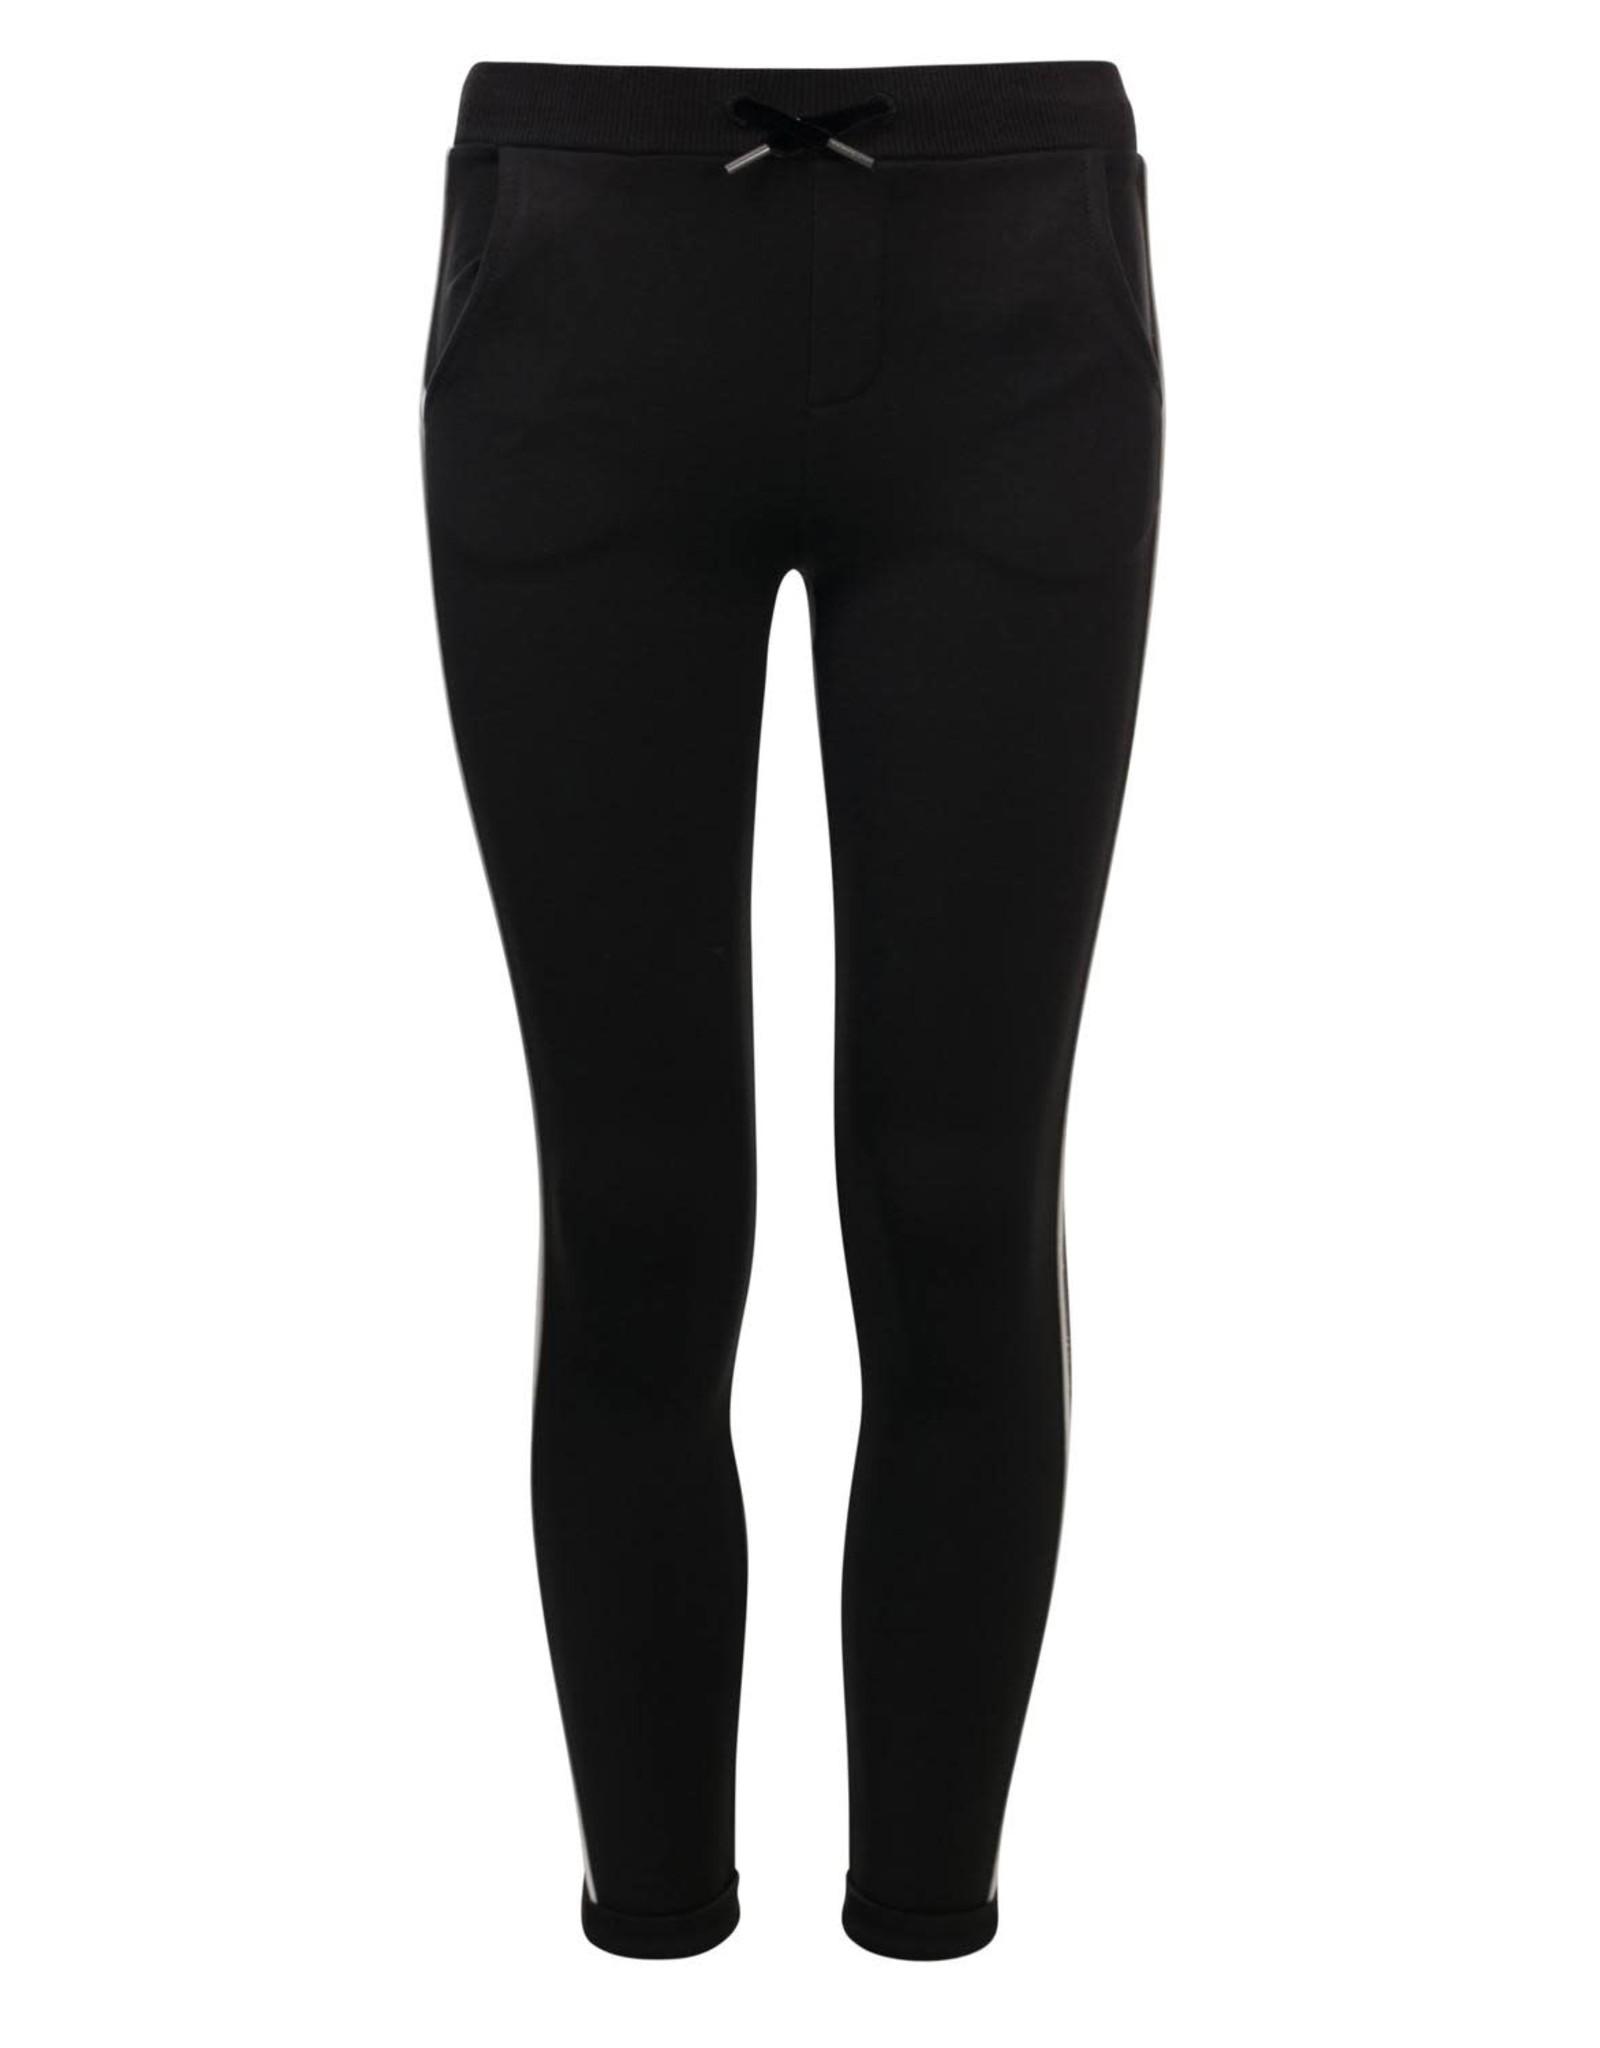 Looxs Girls sweat pants Black